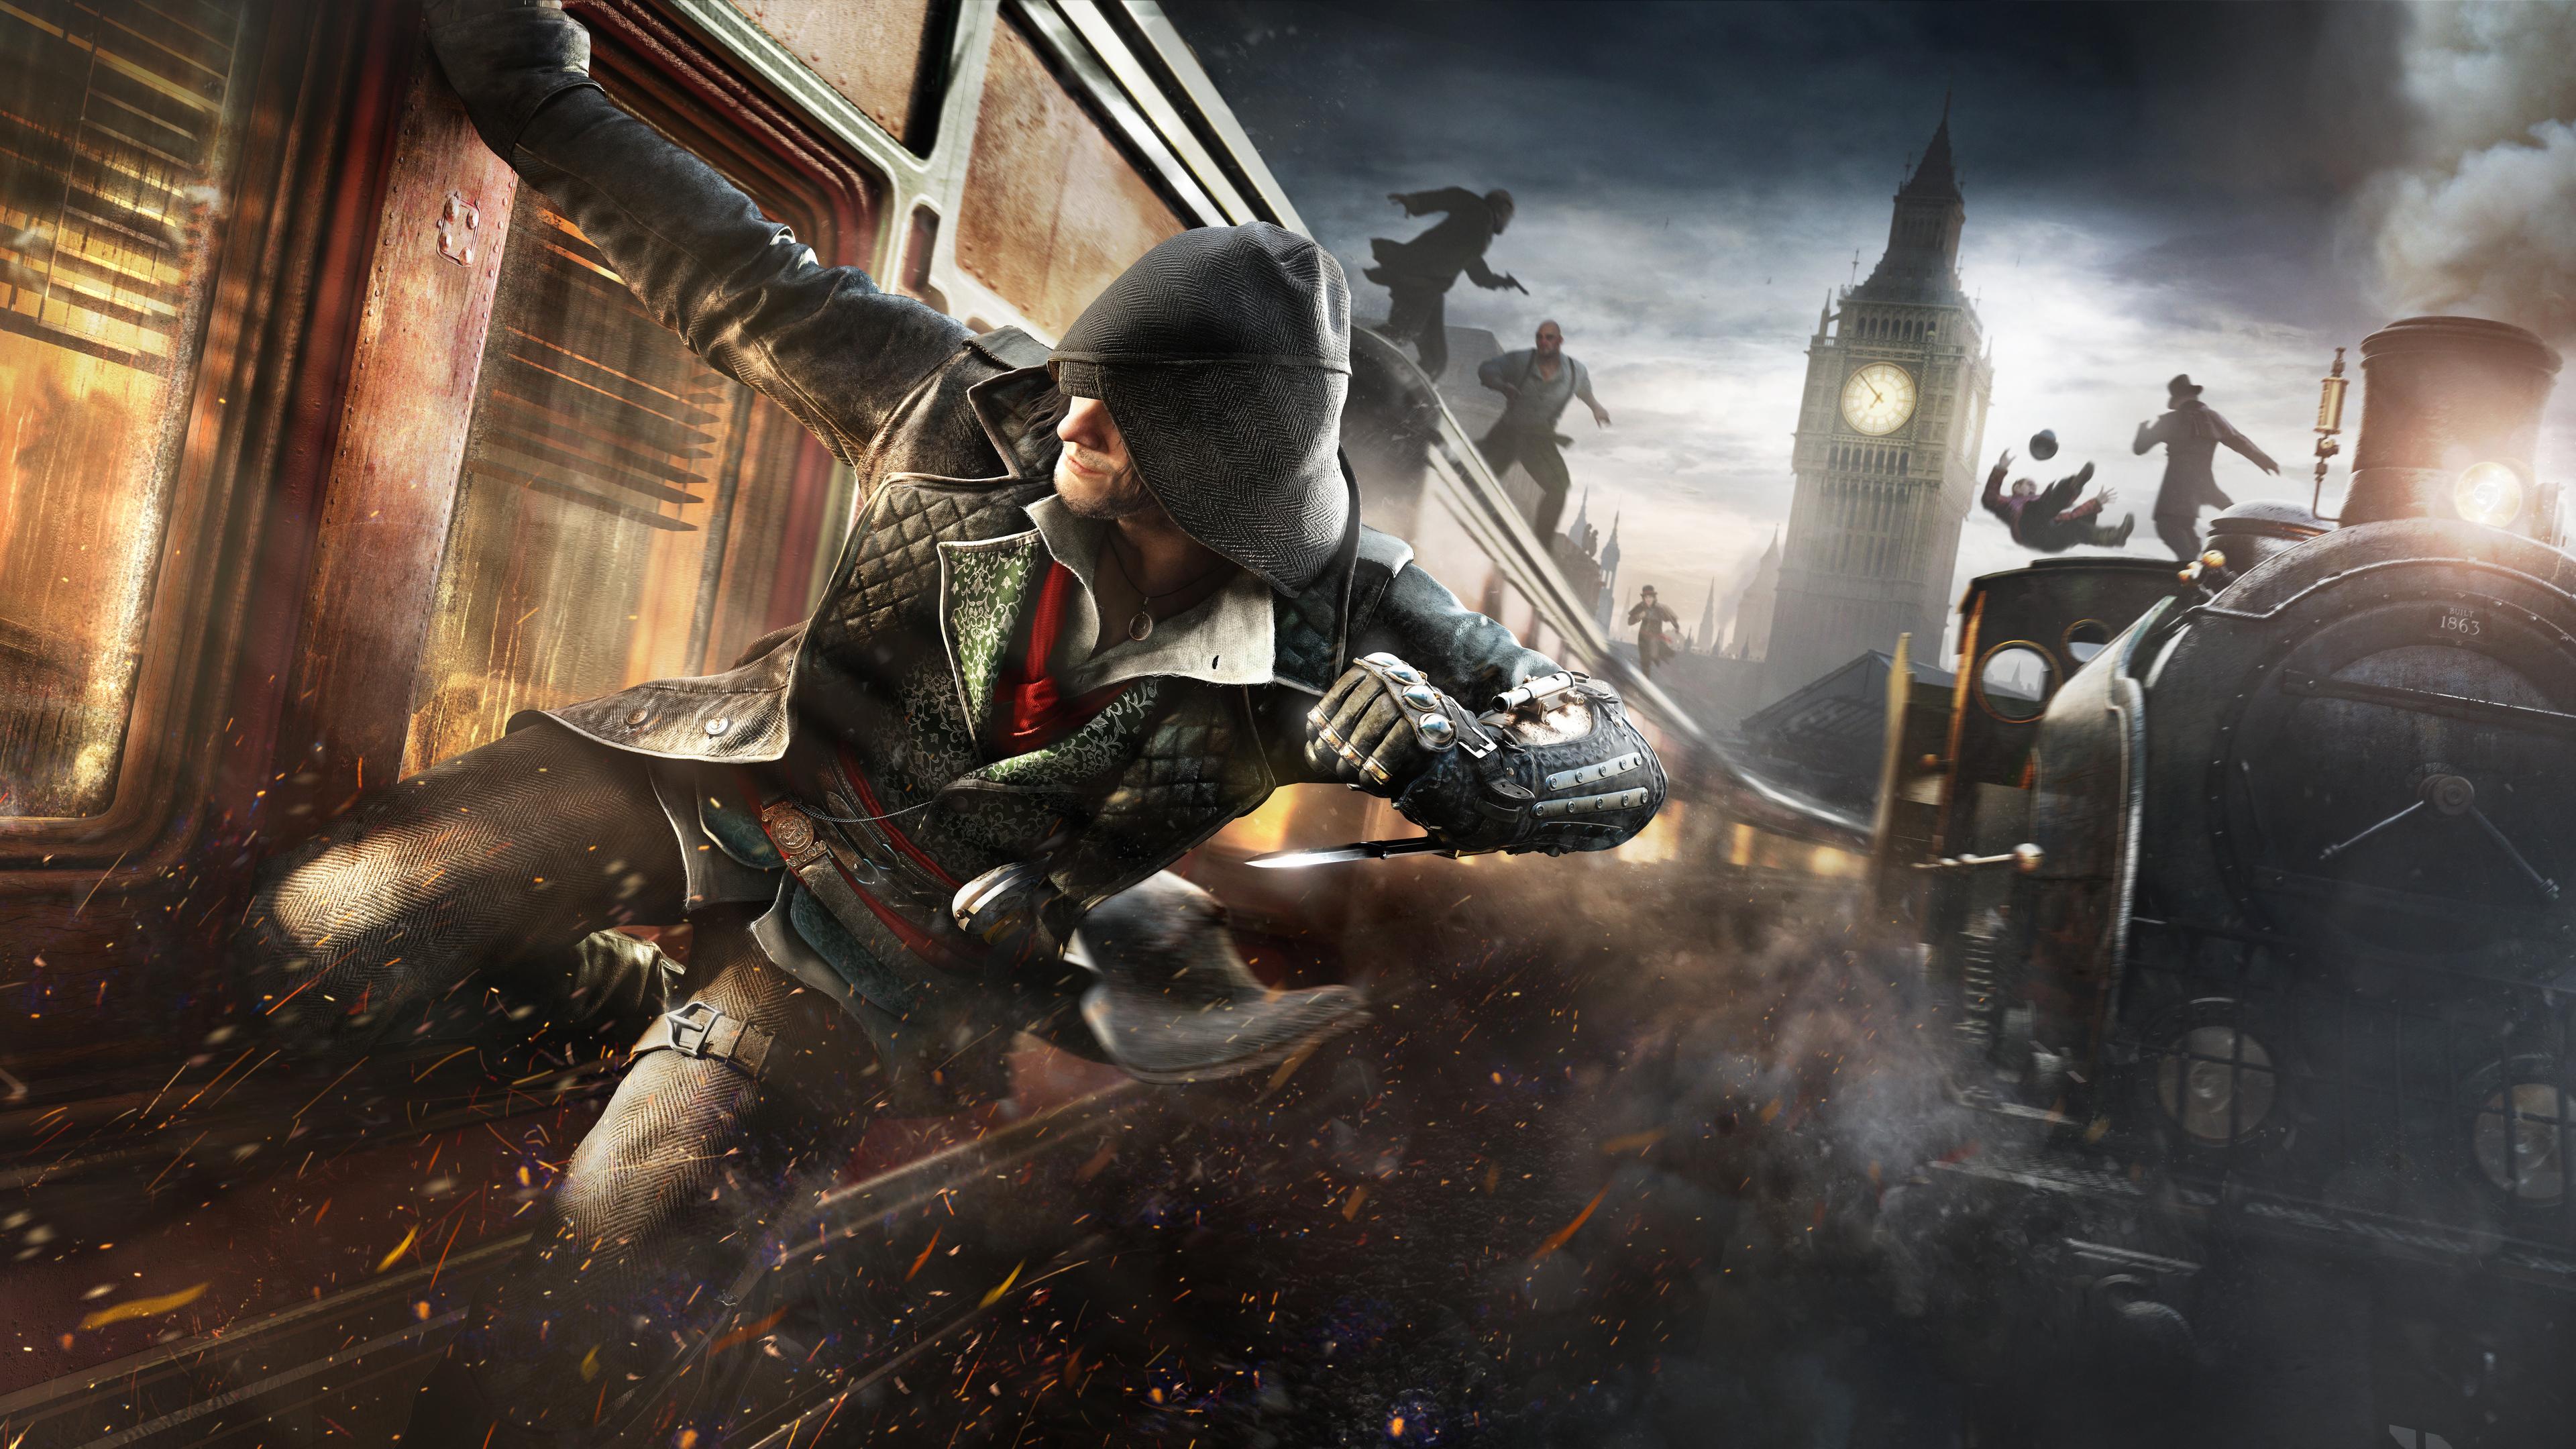 Wallpaper 4k Assassins Creed Syndicate Train Banner 4k 2019